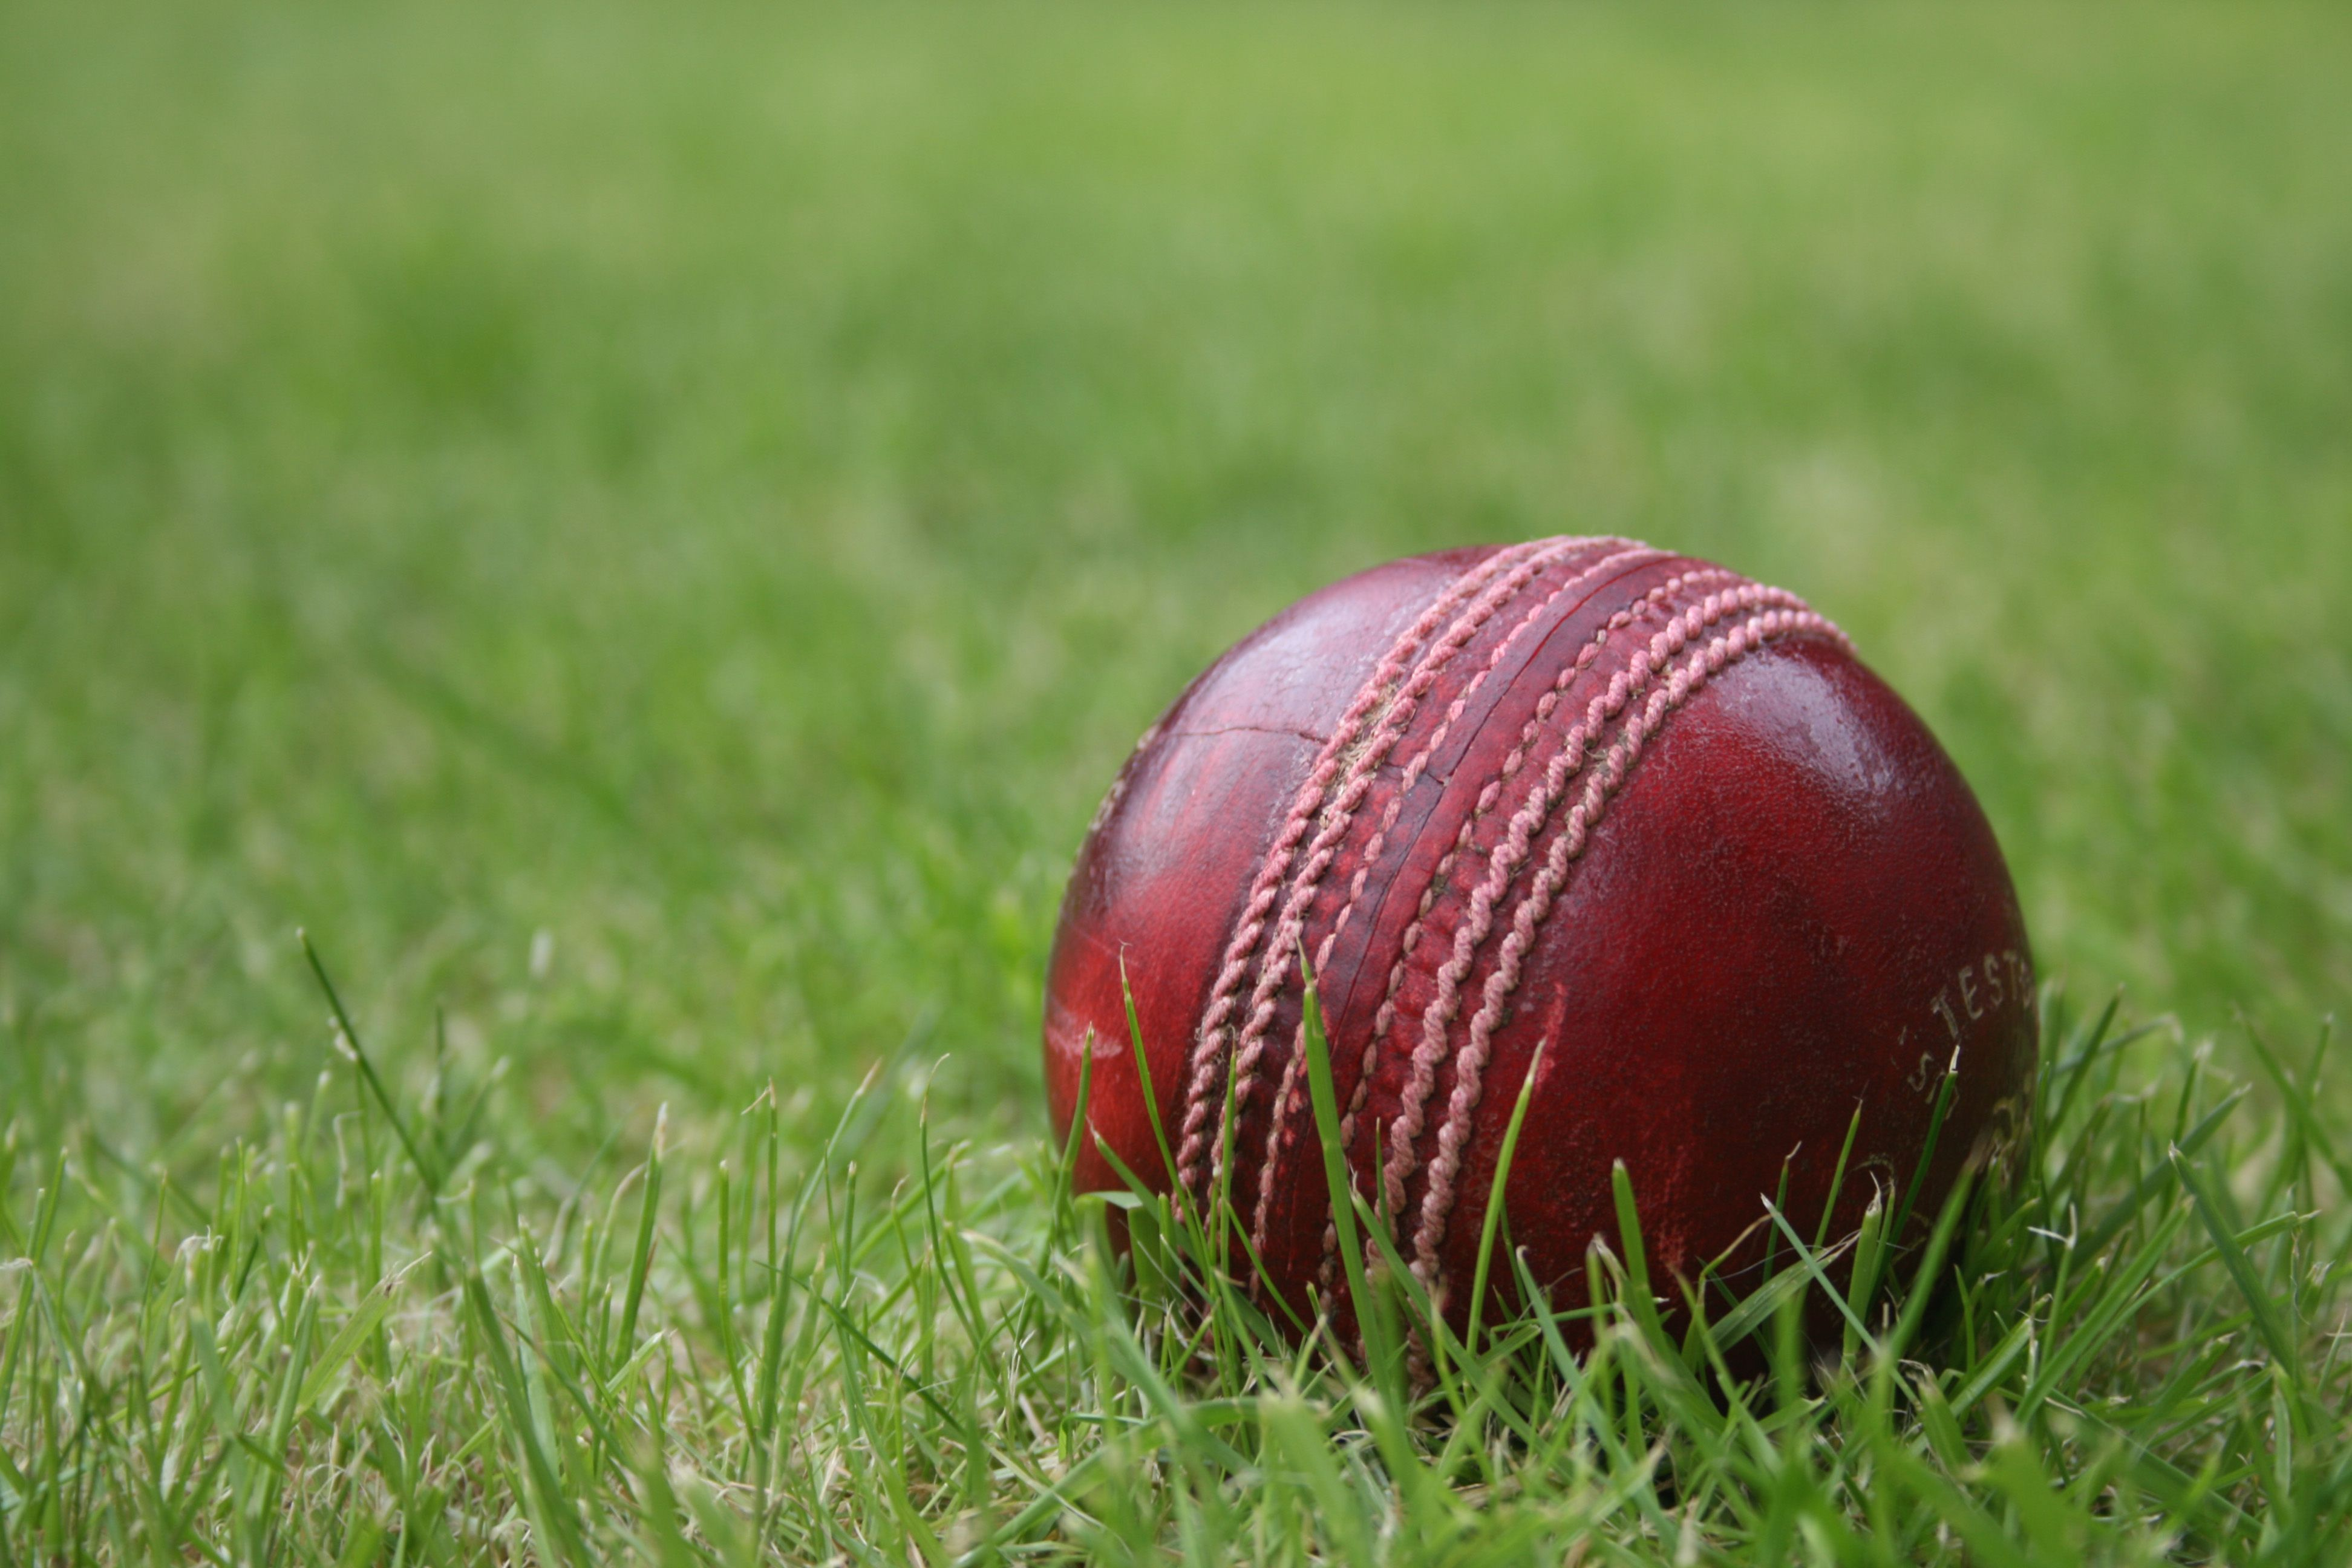 Cricket Cricket Streaming Cricket Balls India Cricket Team